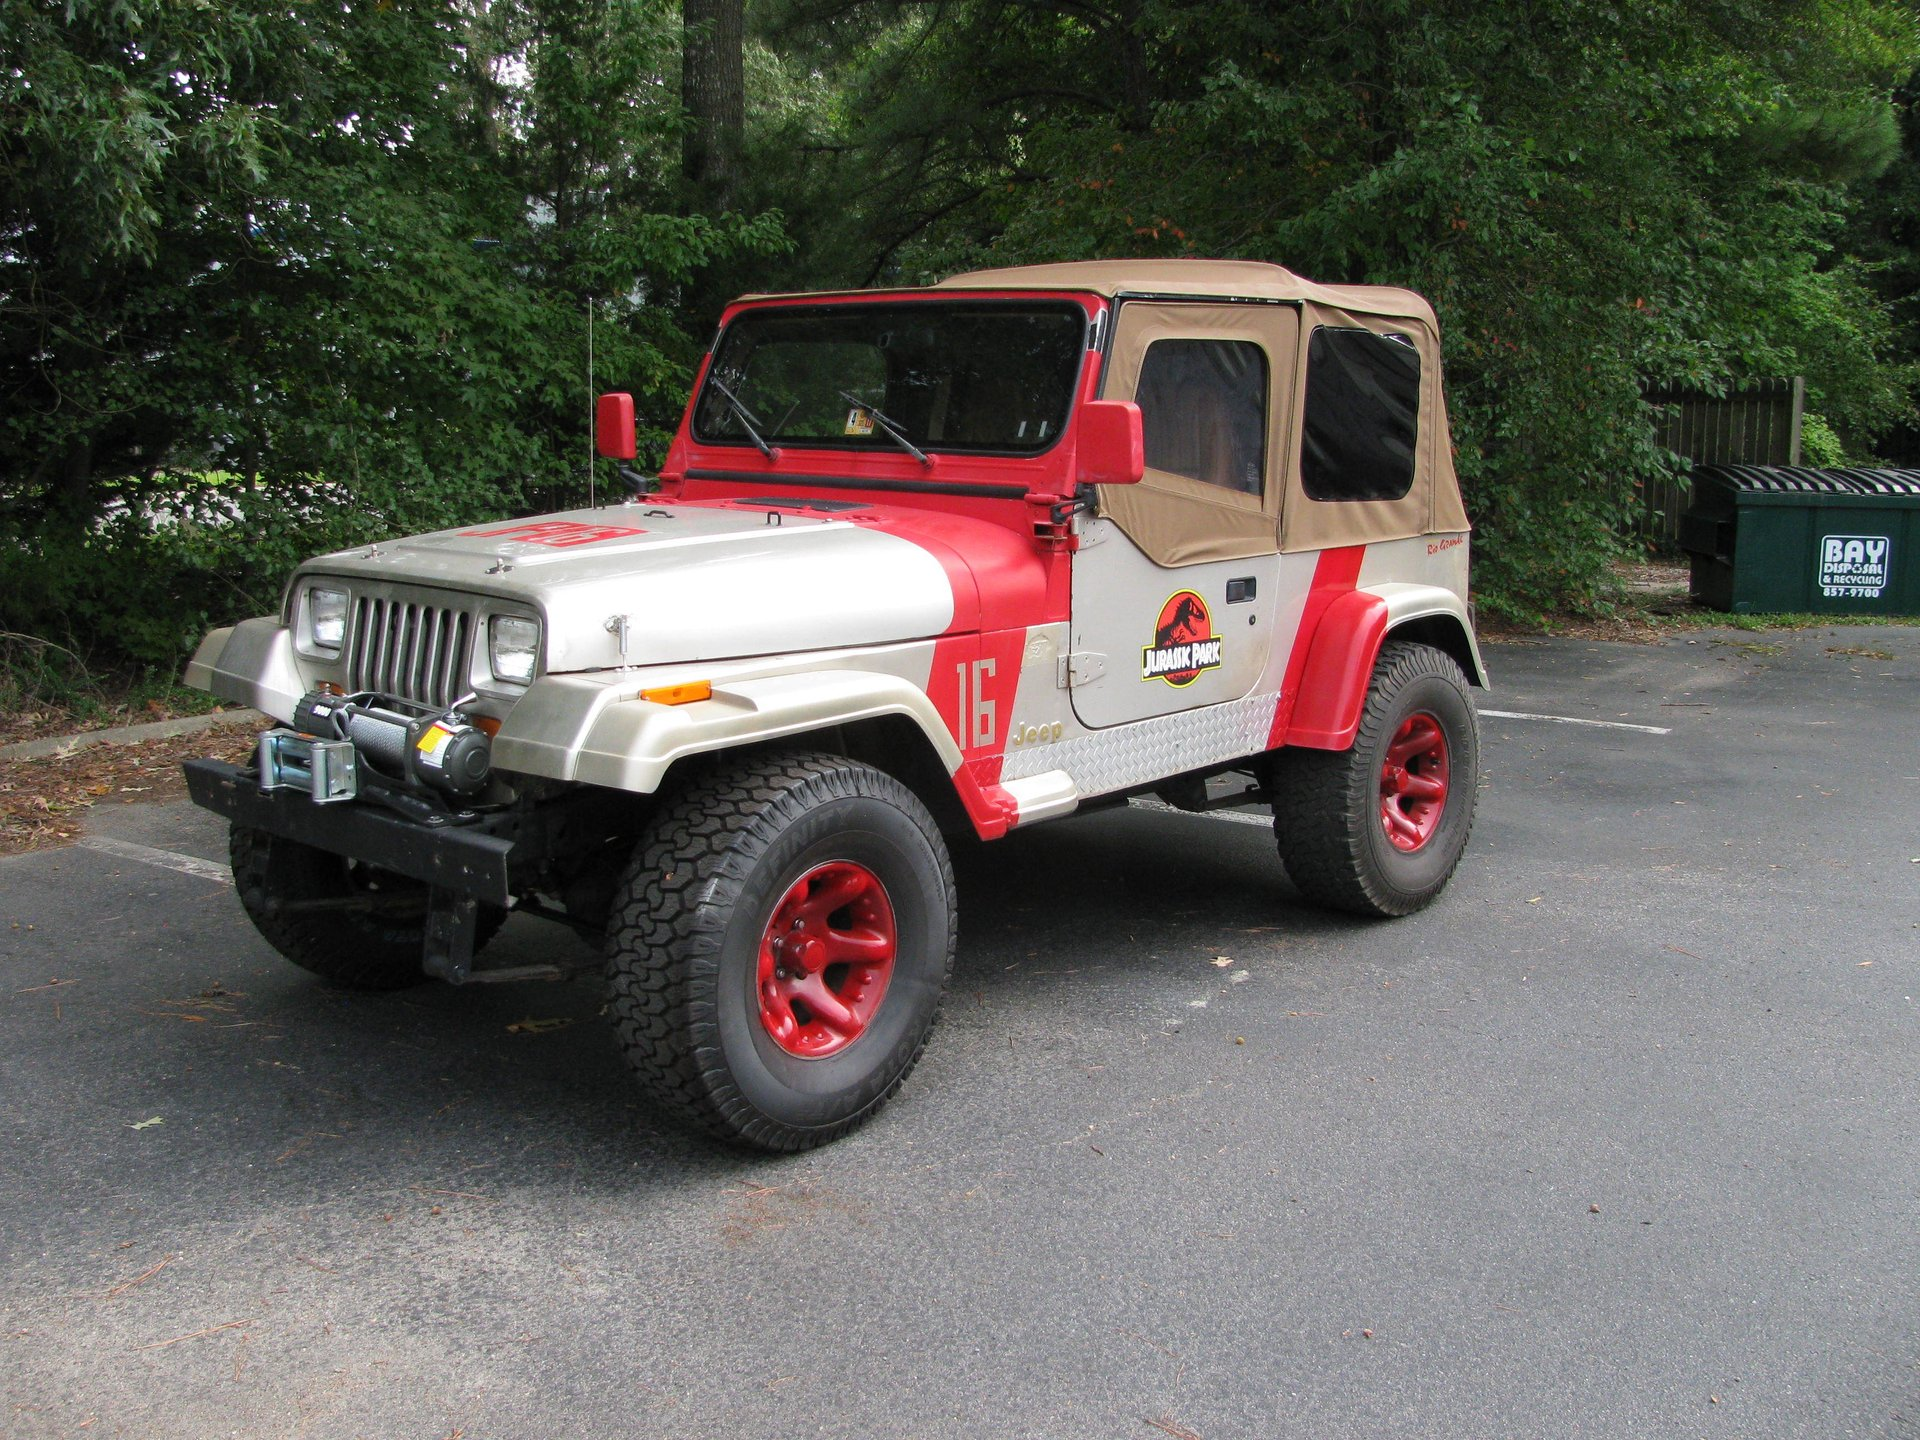 1995 jeep wrangler rio grande jurassic park